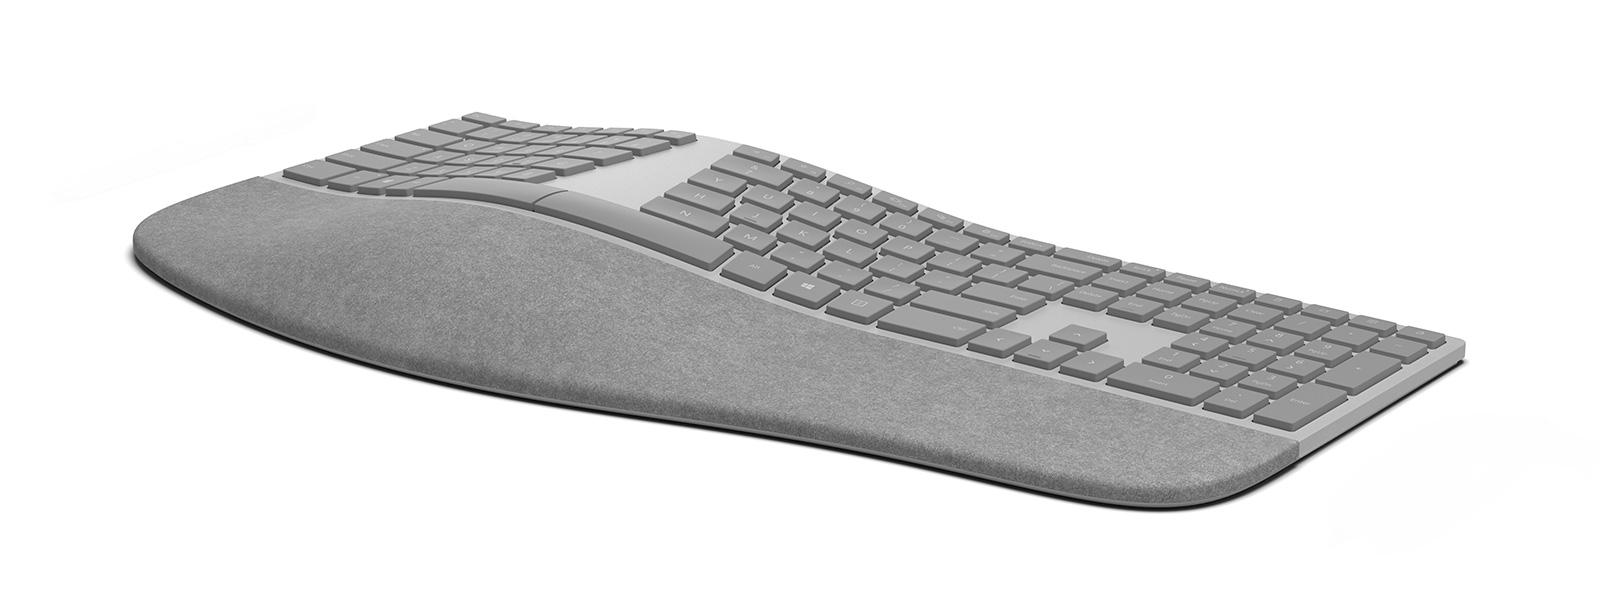 Surface エルゴノミクス キーボード (Surface Ergonomic Keyboard)